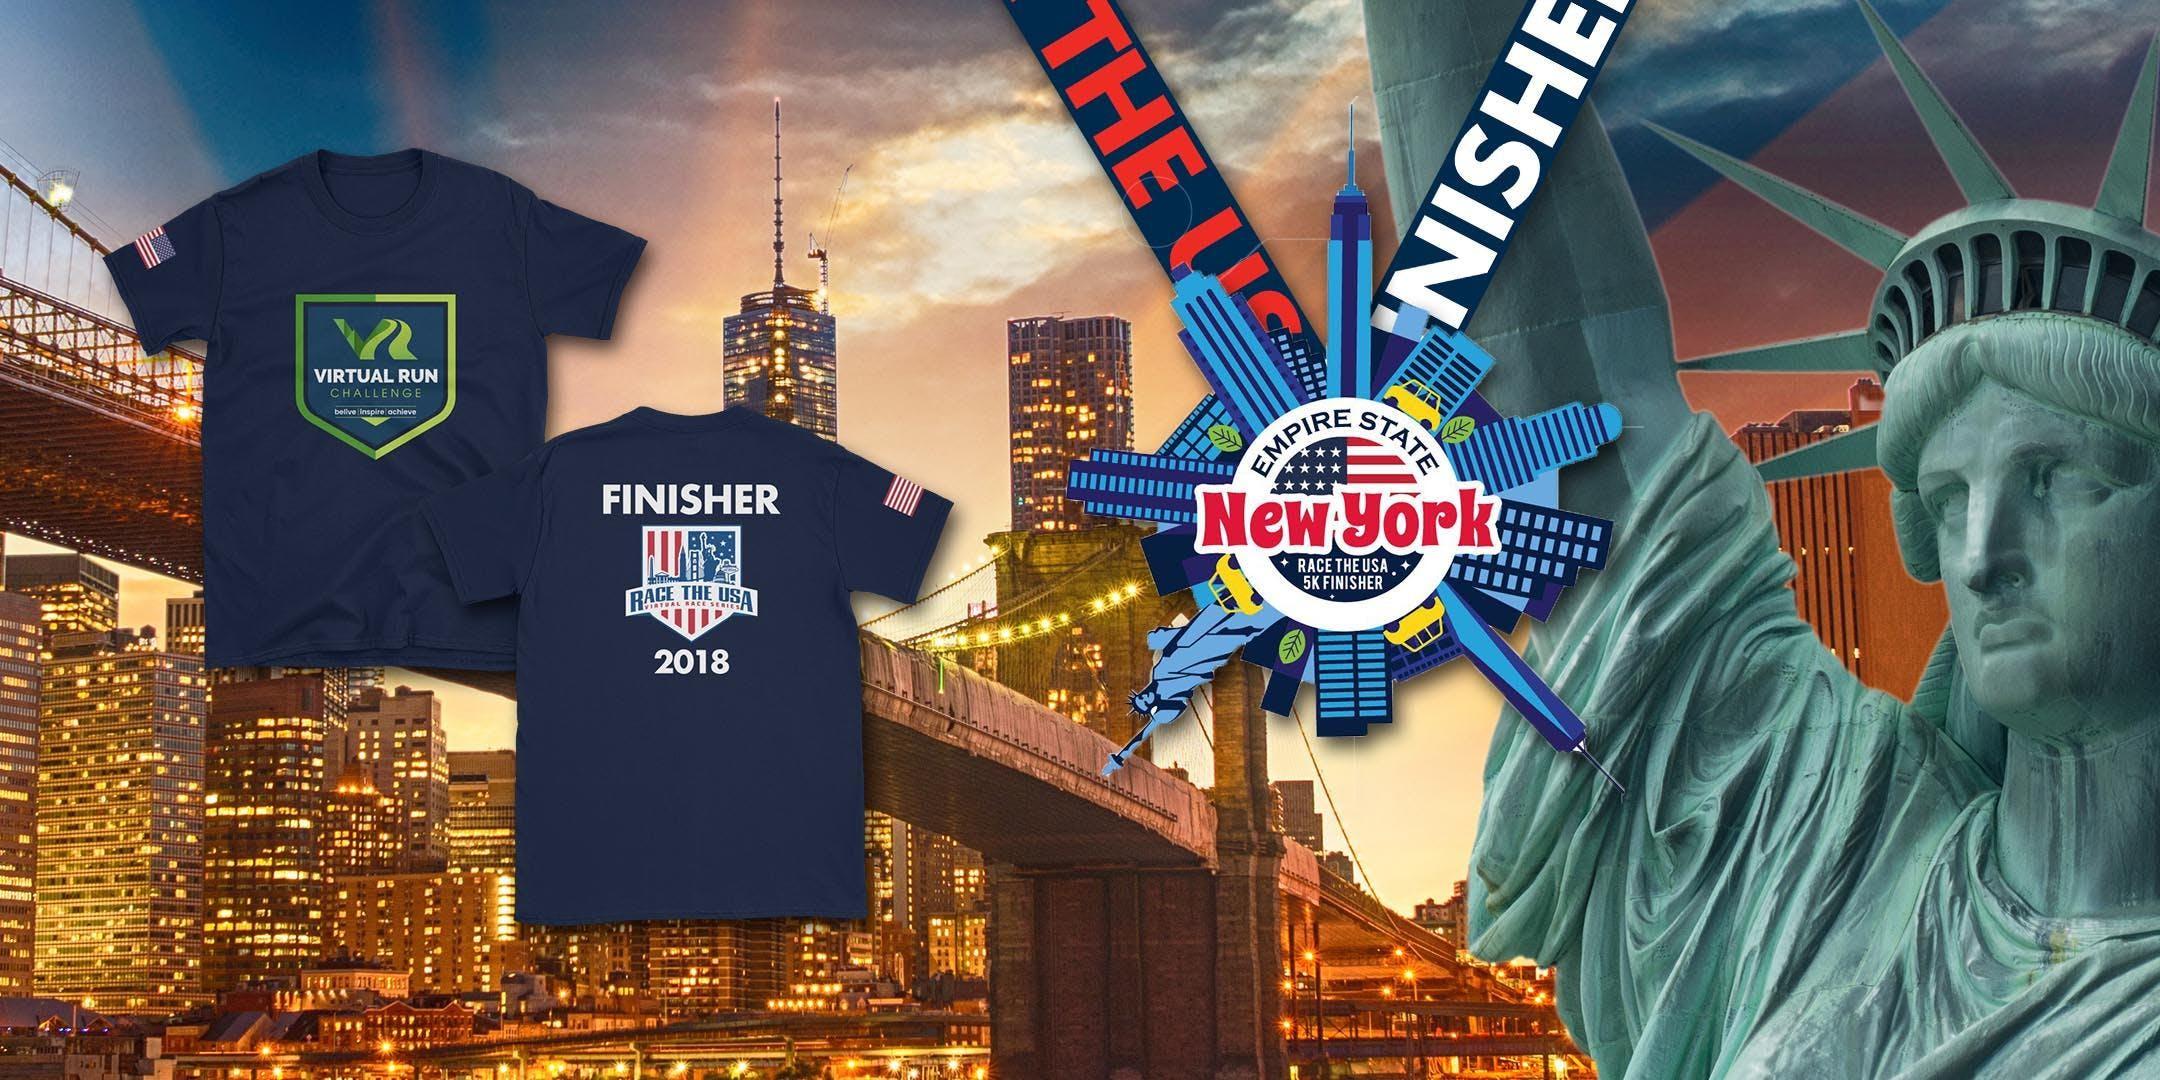 Race the USA  New York Virtual 5k Run/Walk - New York